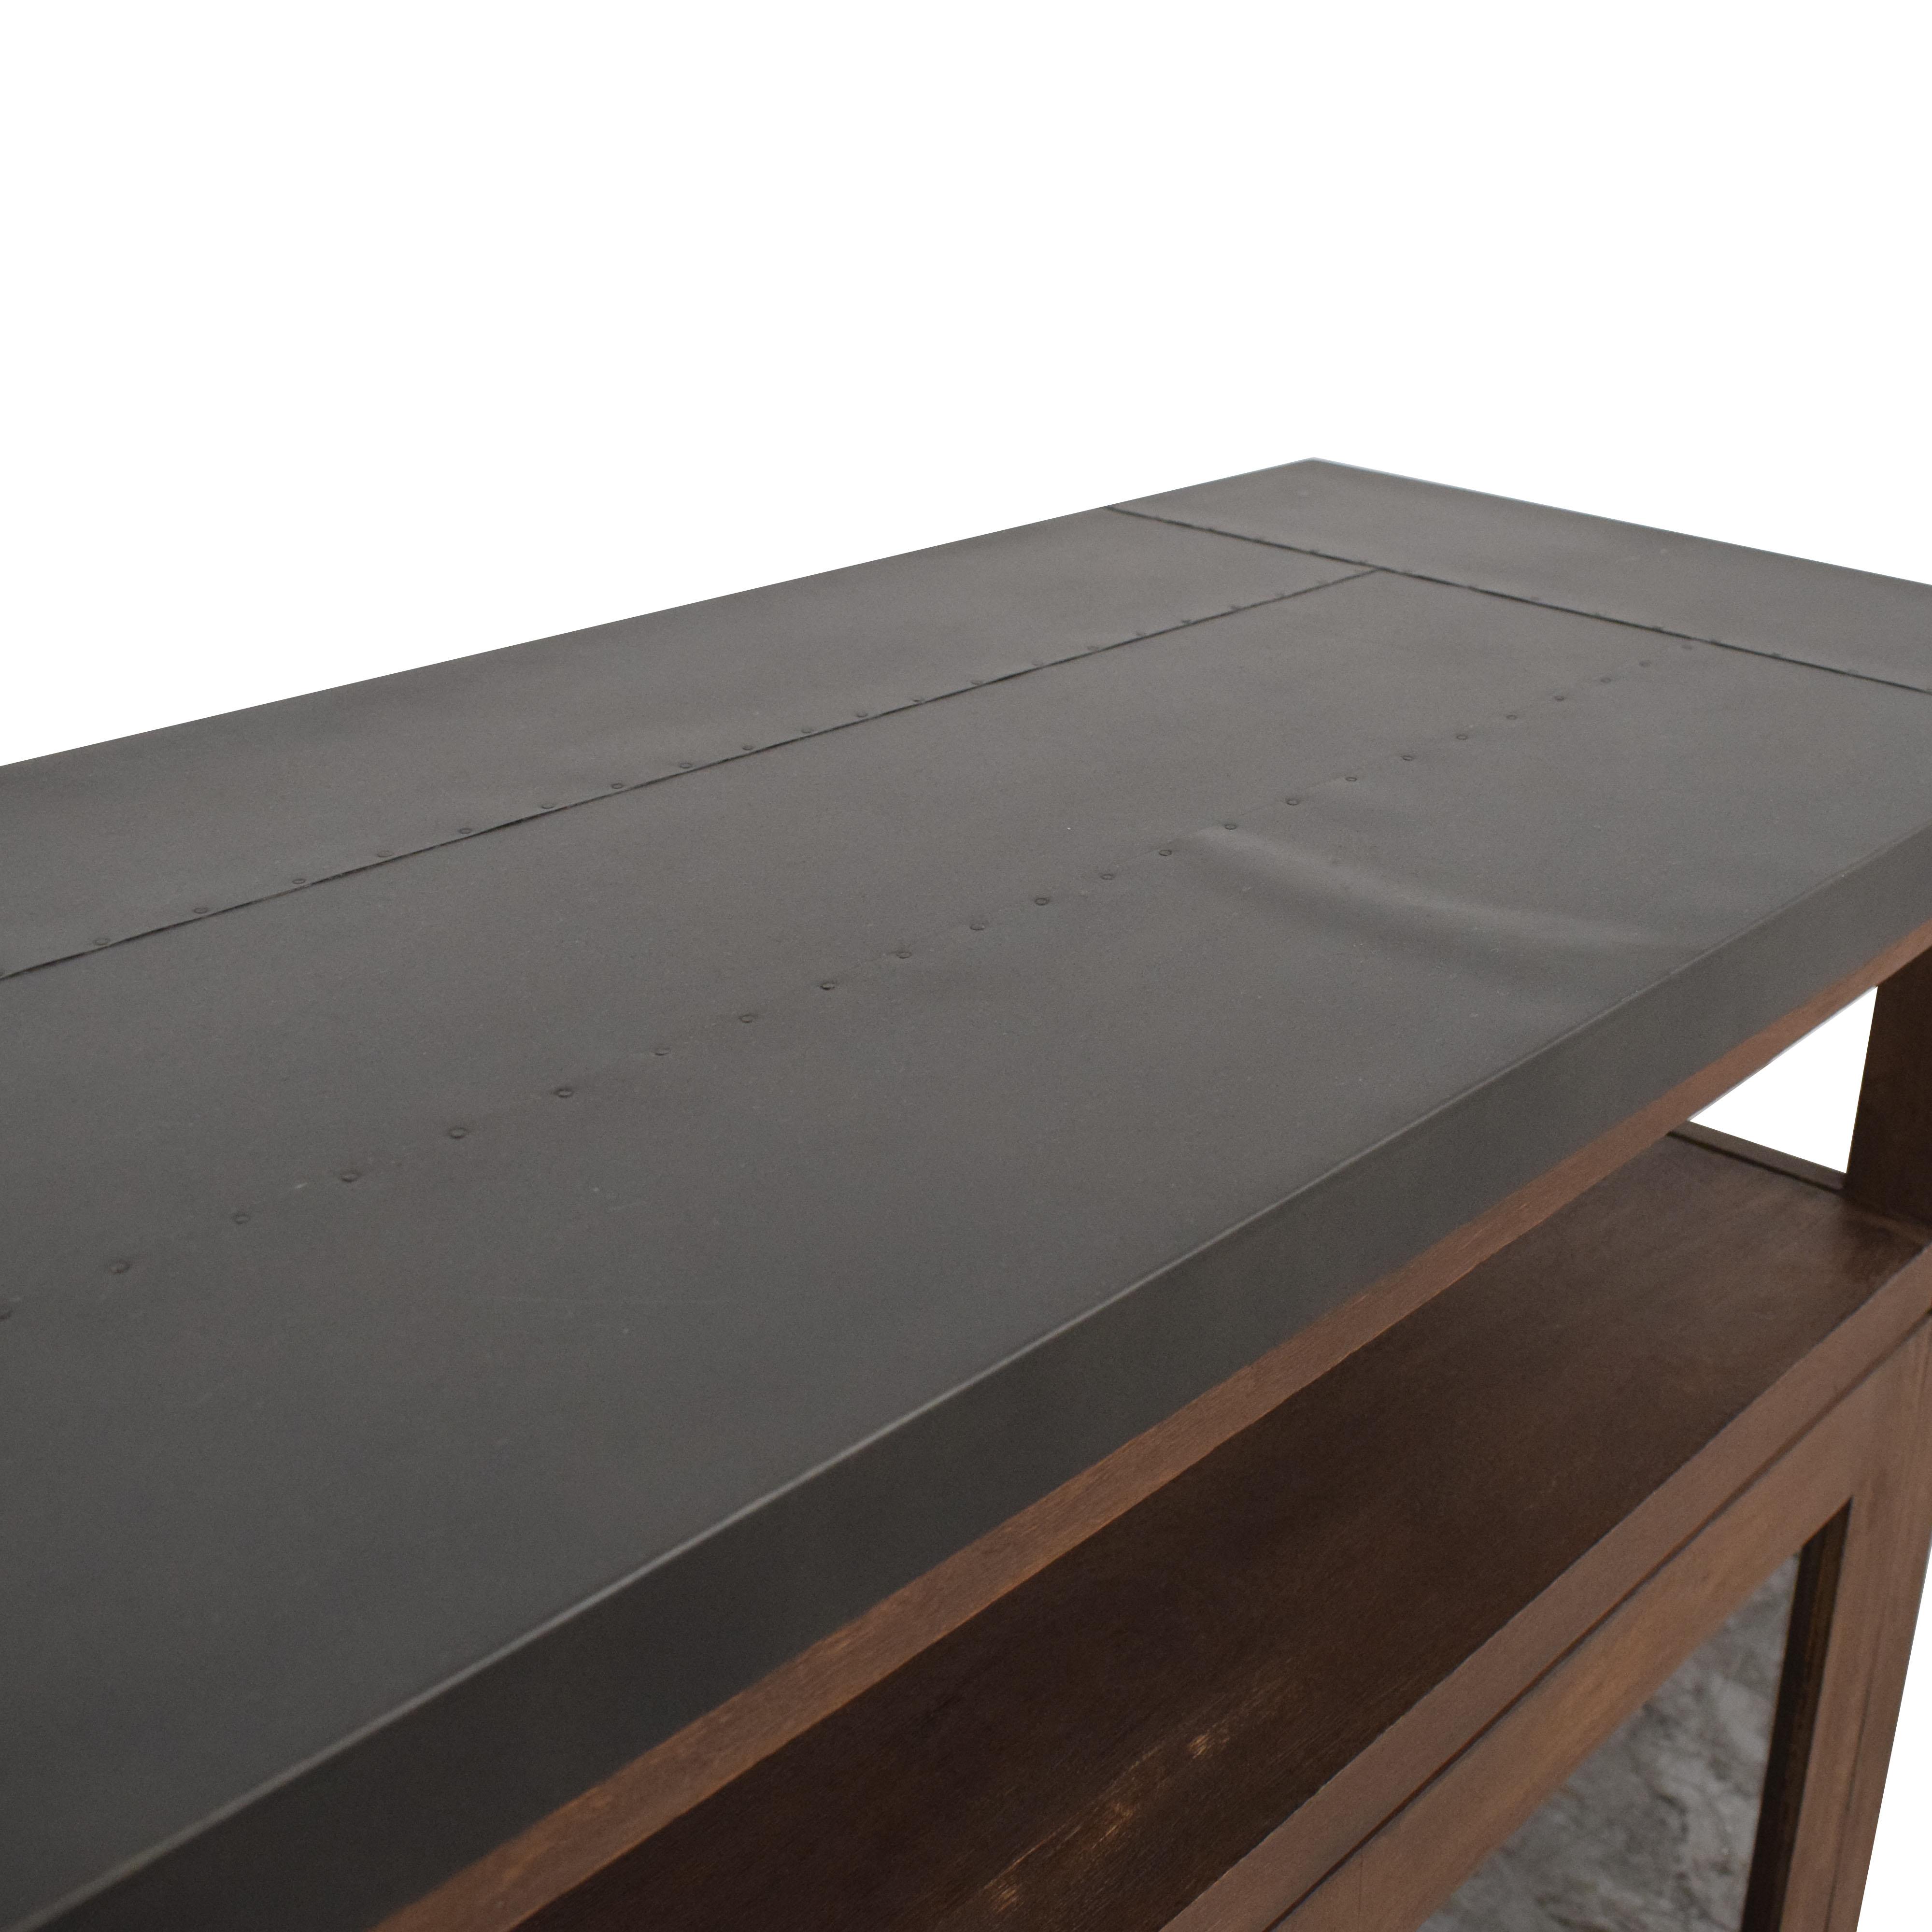 Crate & Barrel Galvin Sideboard sale